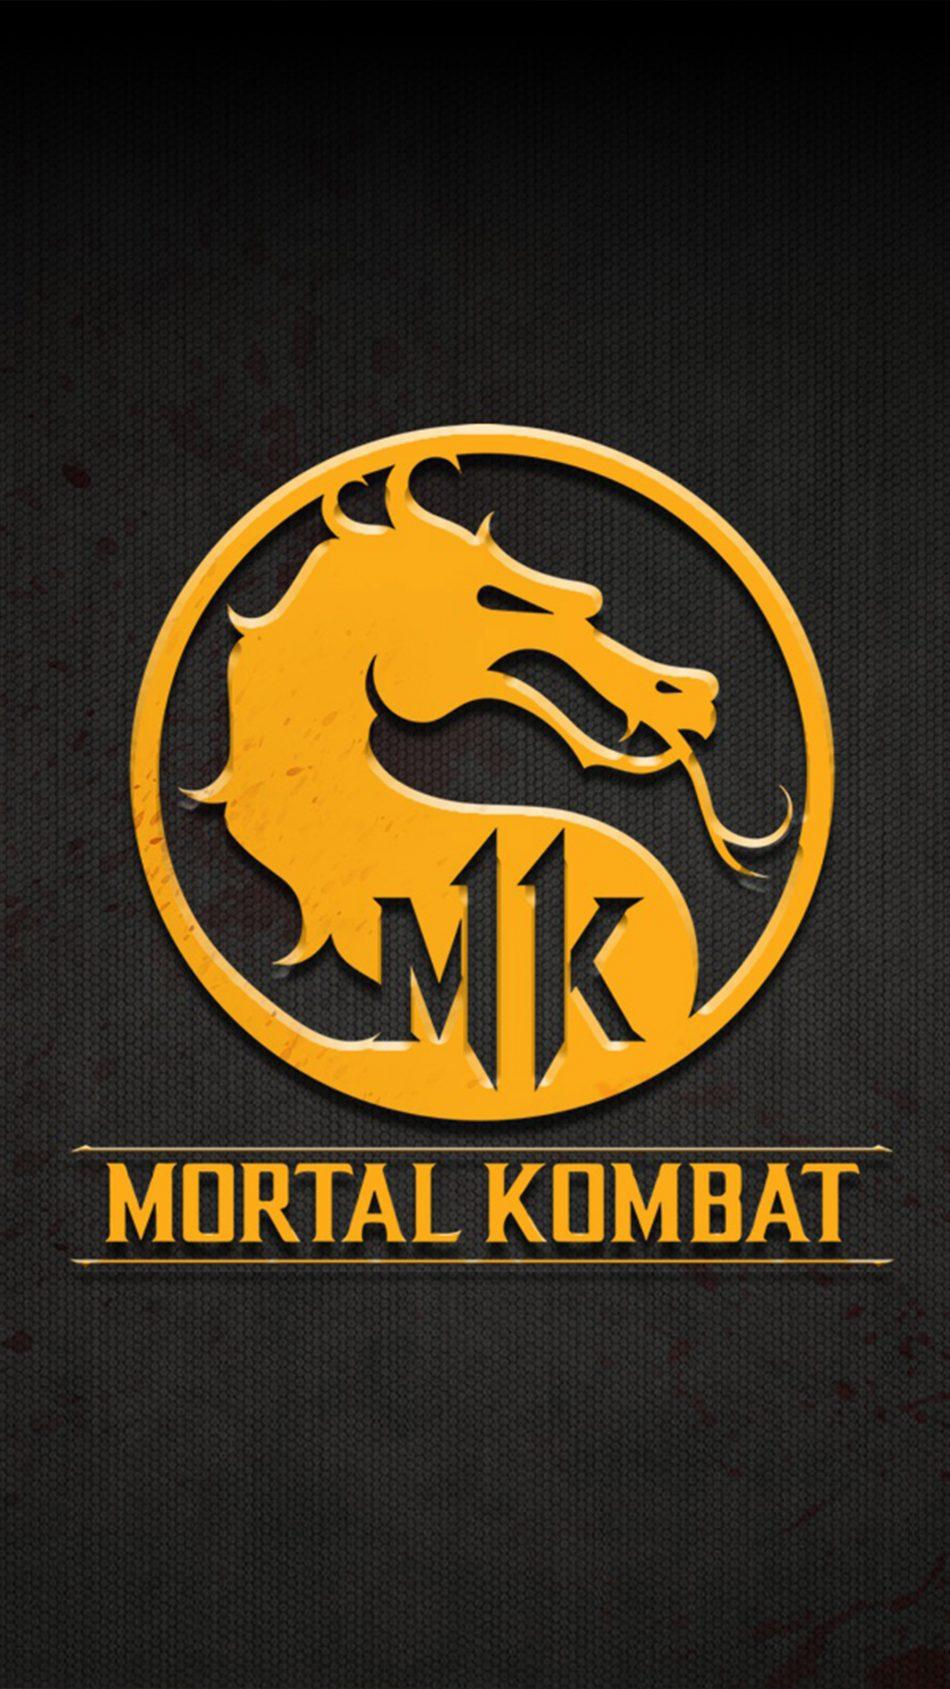 Download Mortal Kombat 11 Logo Free Pure 4K Ultra HD Mobile Wallpaper